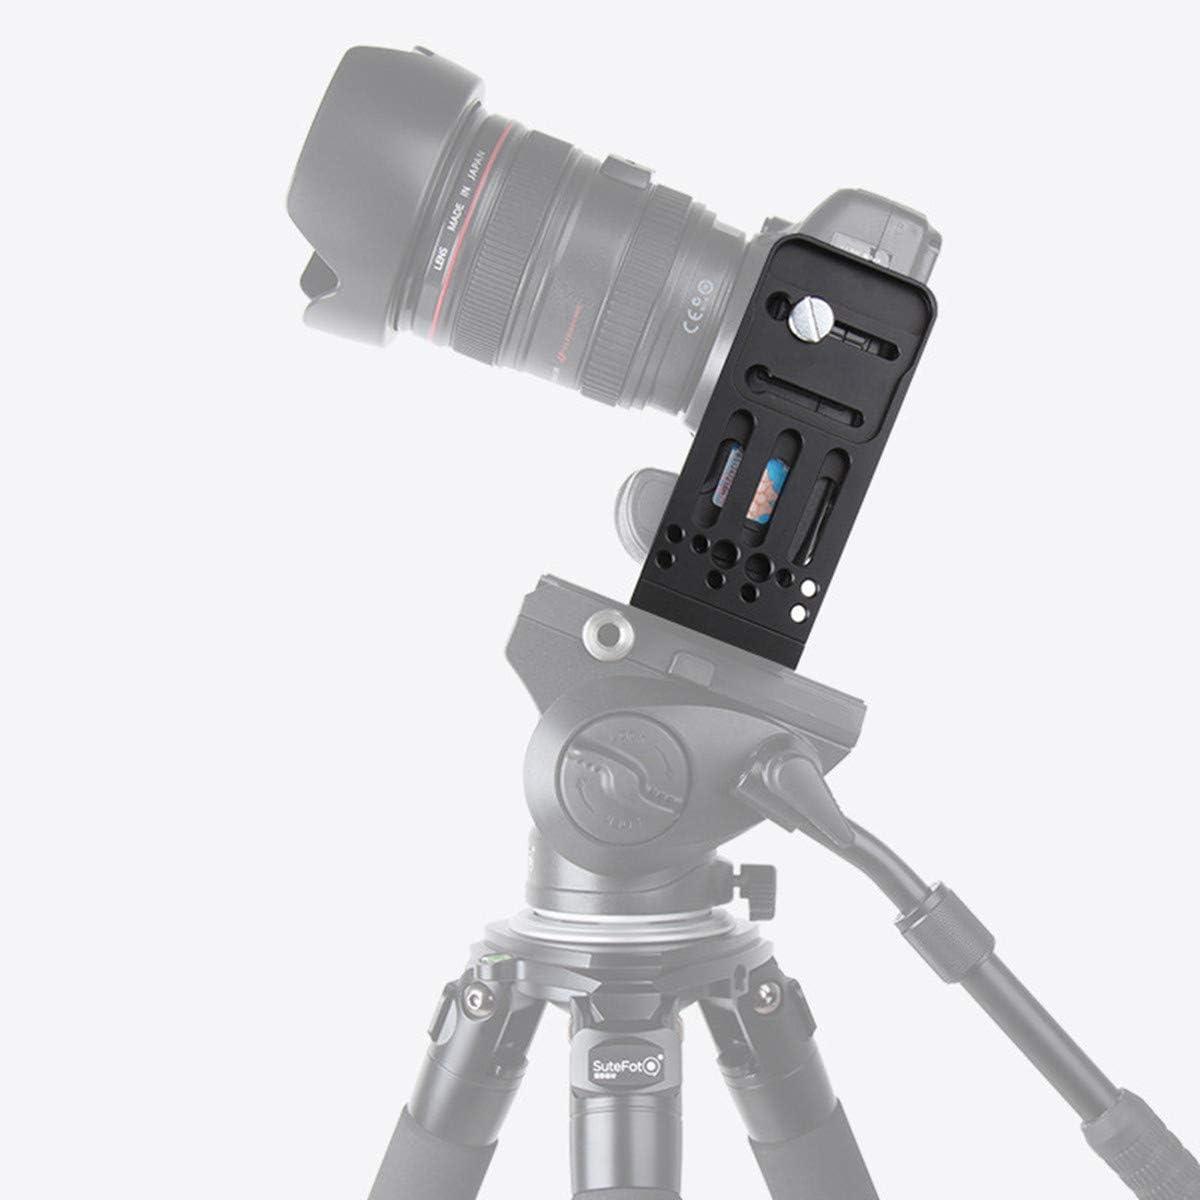 Amazon.com: Soporte universal para cámara.: Camera & Photo